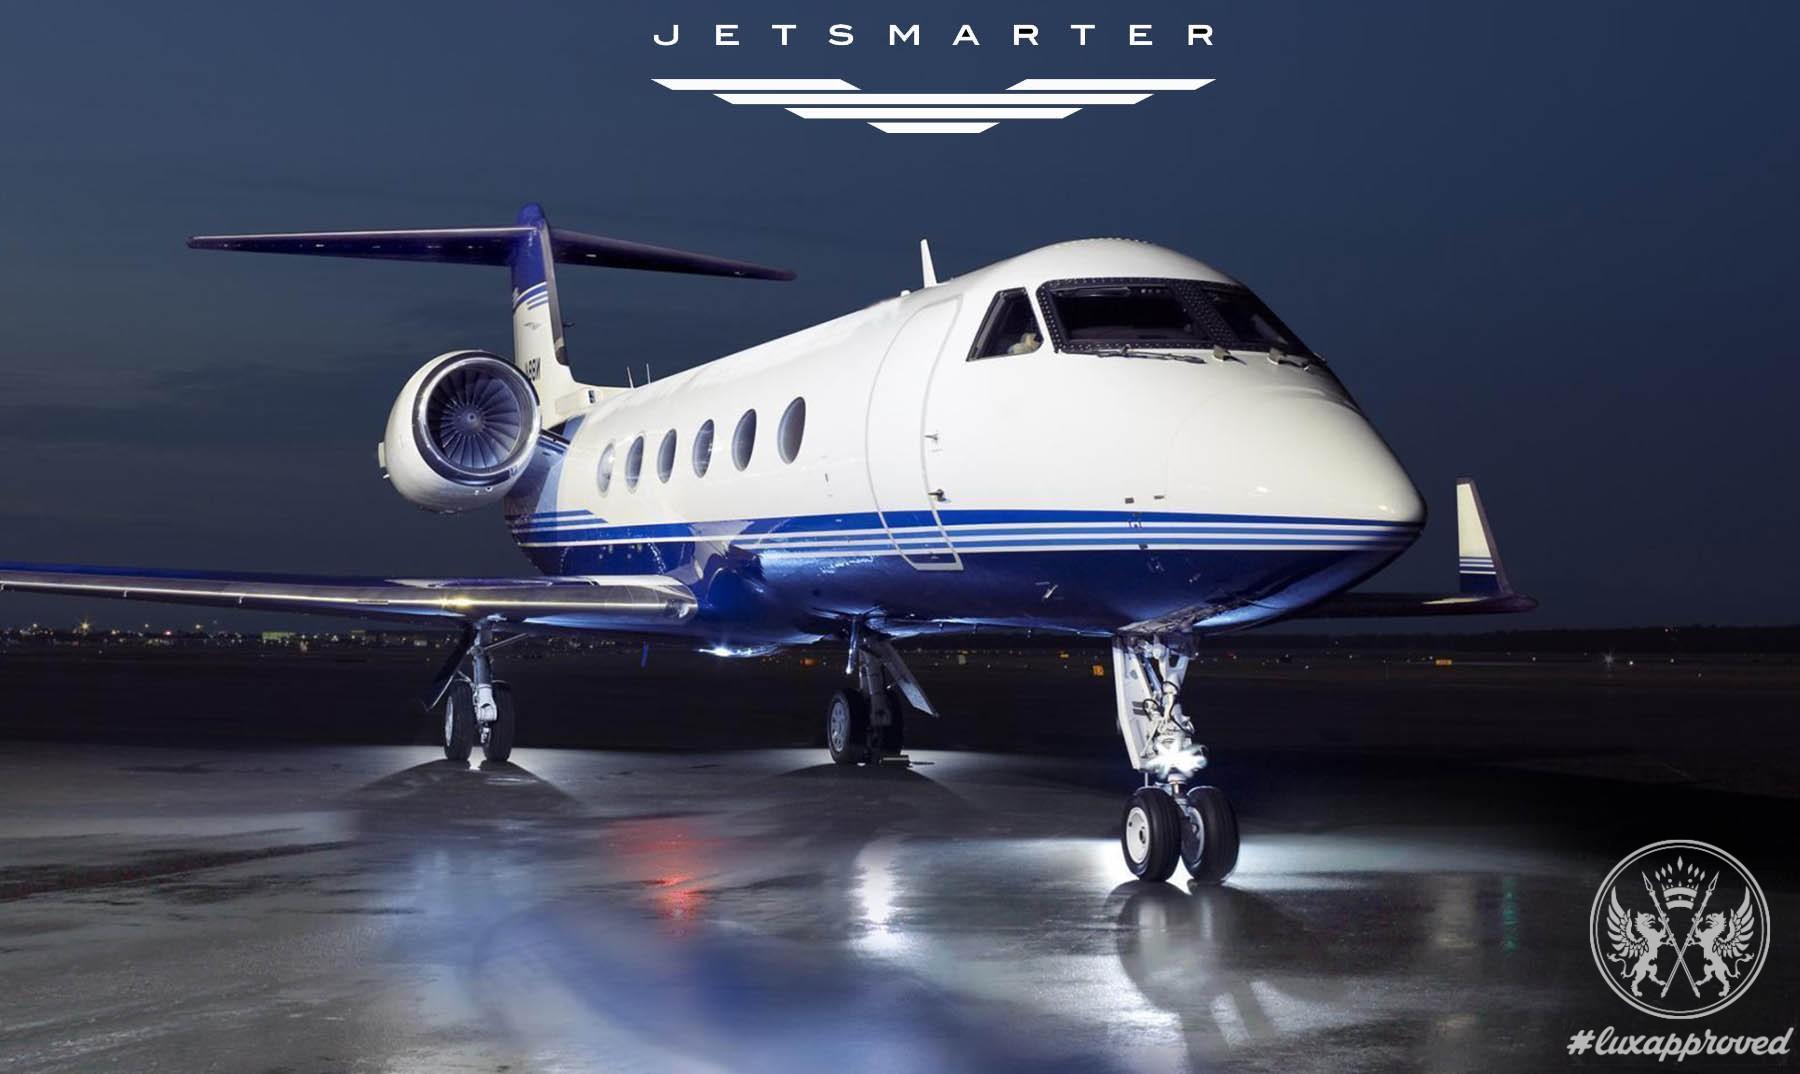 JetSmarter Transatlantic JetShuttle Service New York To London